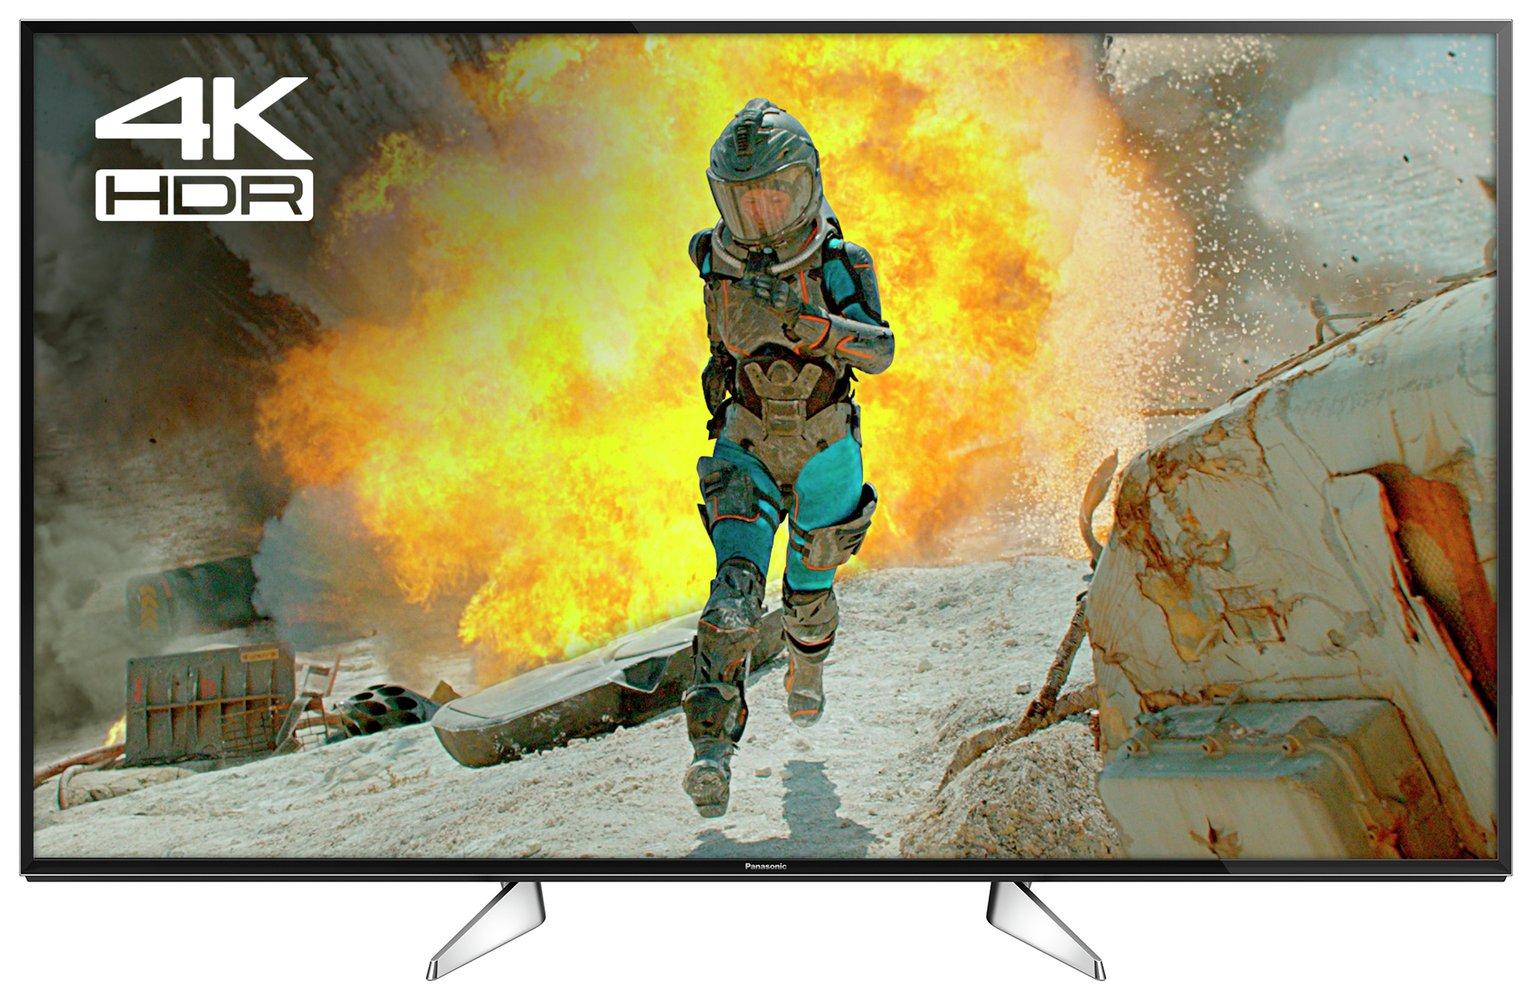 hitachi 65hl6t64u 65 inch 4k ultra hd smart tv. panasonic tx-49ex600b 40 inch smart 4k uhd tv with hdr hitachi 65hl6t64u 65 4k ultra hd tv